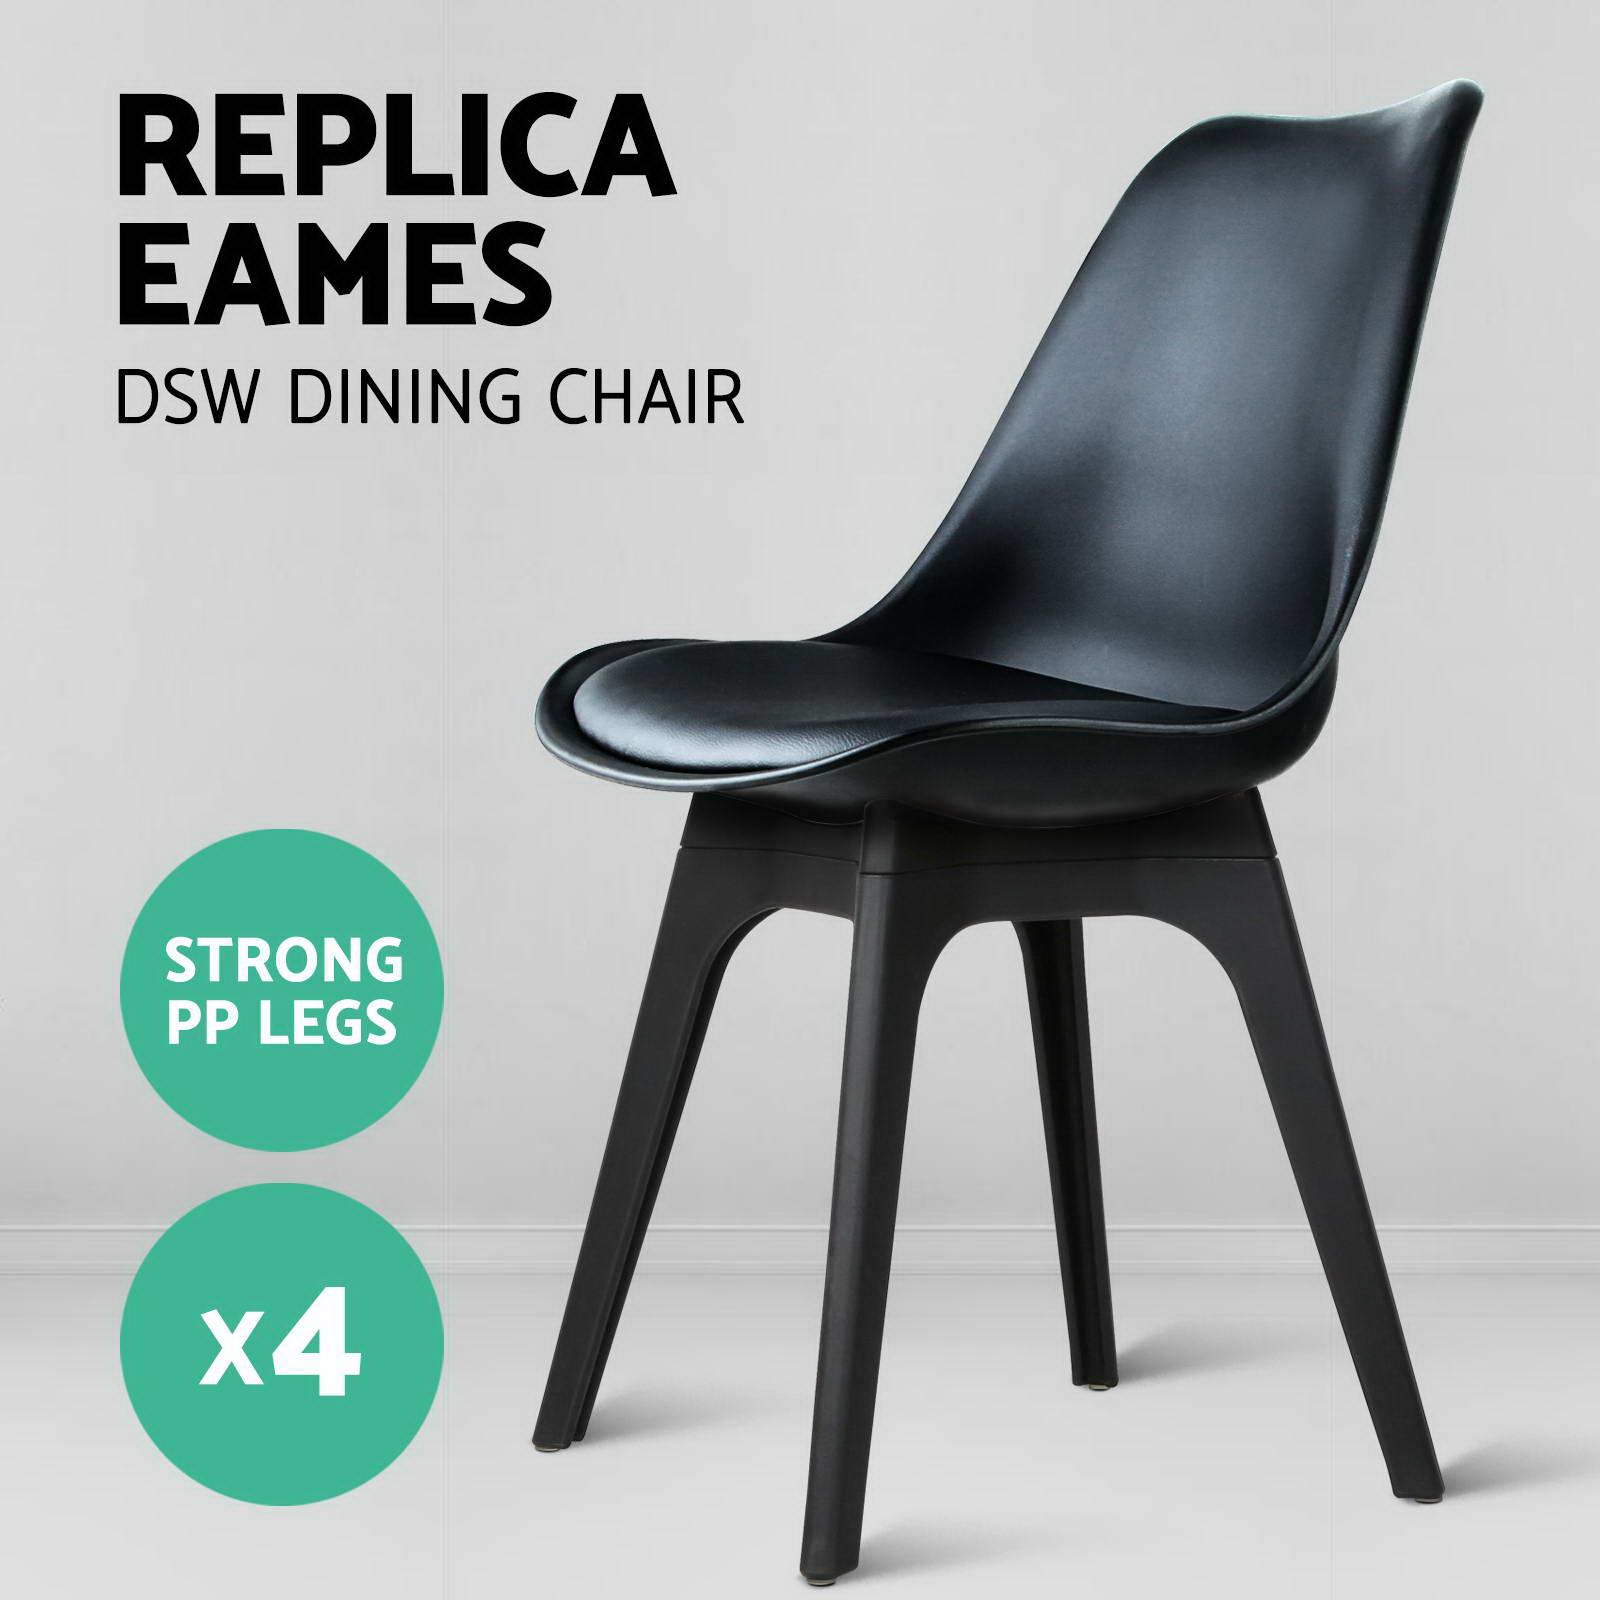 Replica Eames Chair 4 x retro replica eames dsw dining chair daw armchair foam padded